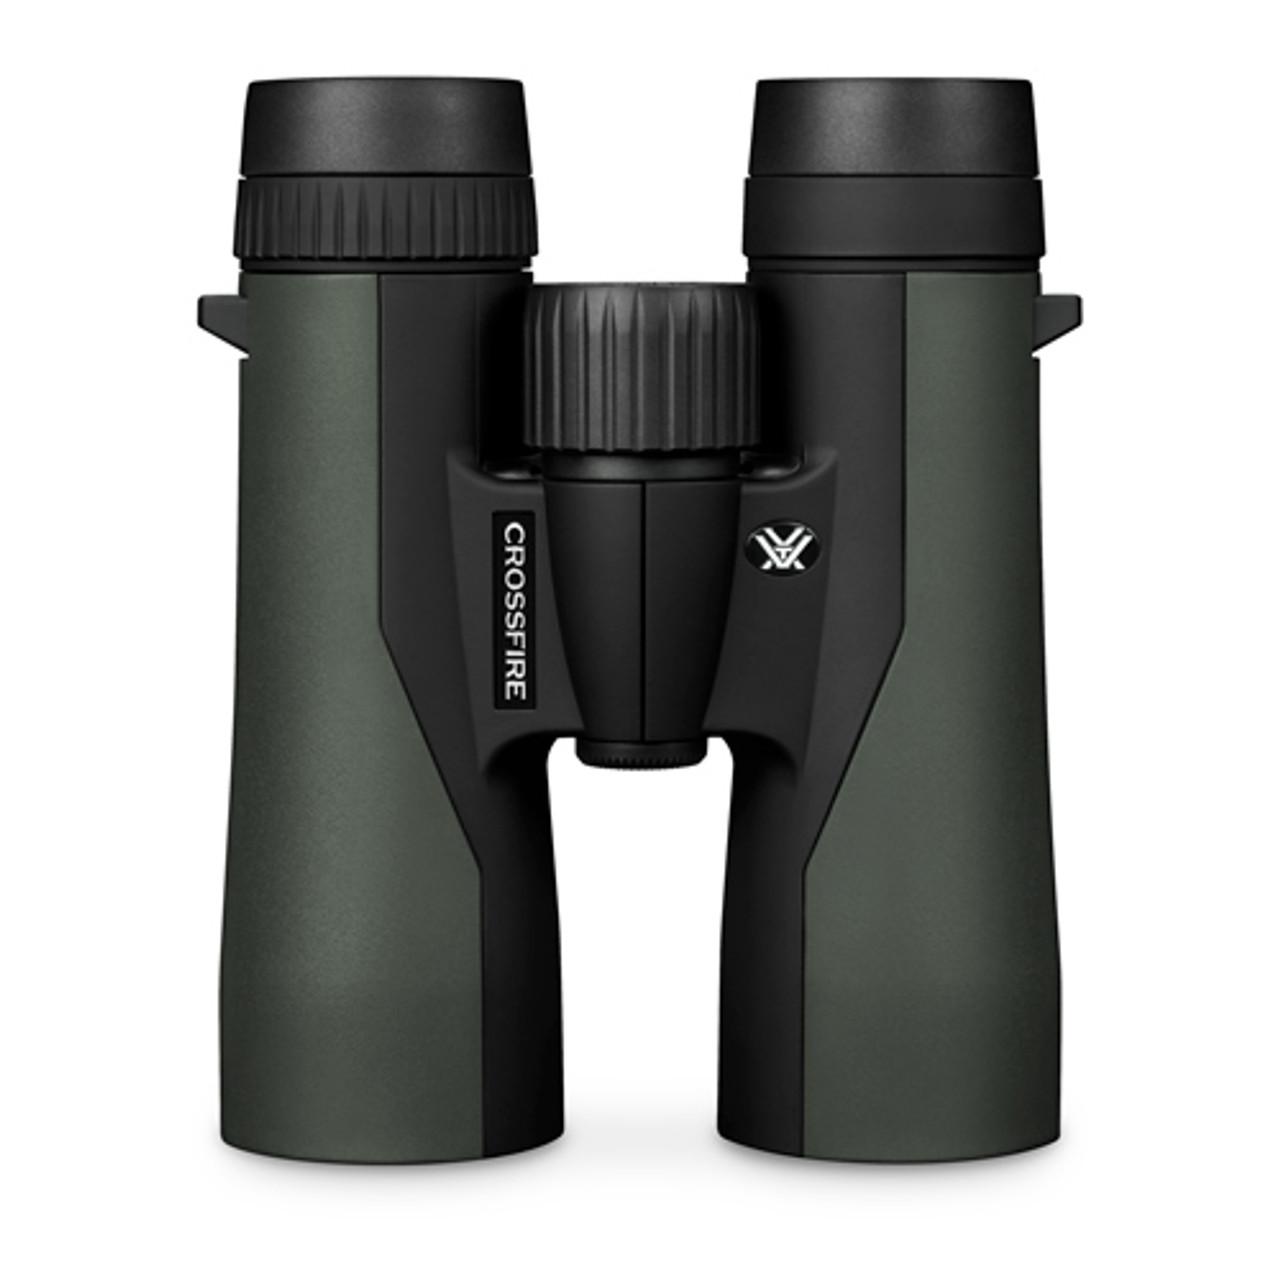 Vortex Crossfire HD 10x42 Binocular